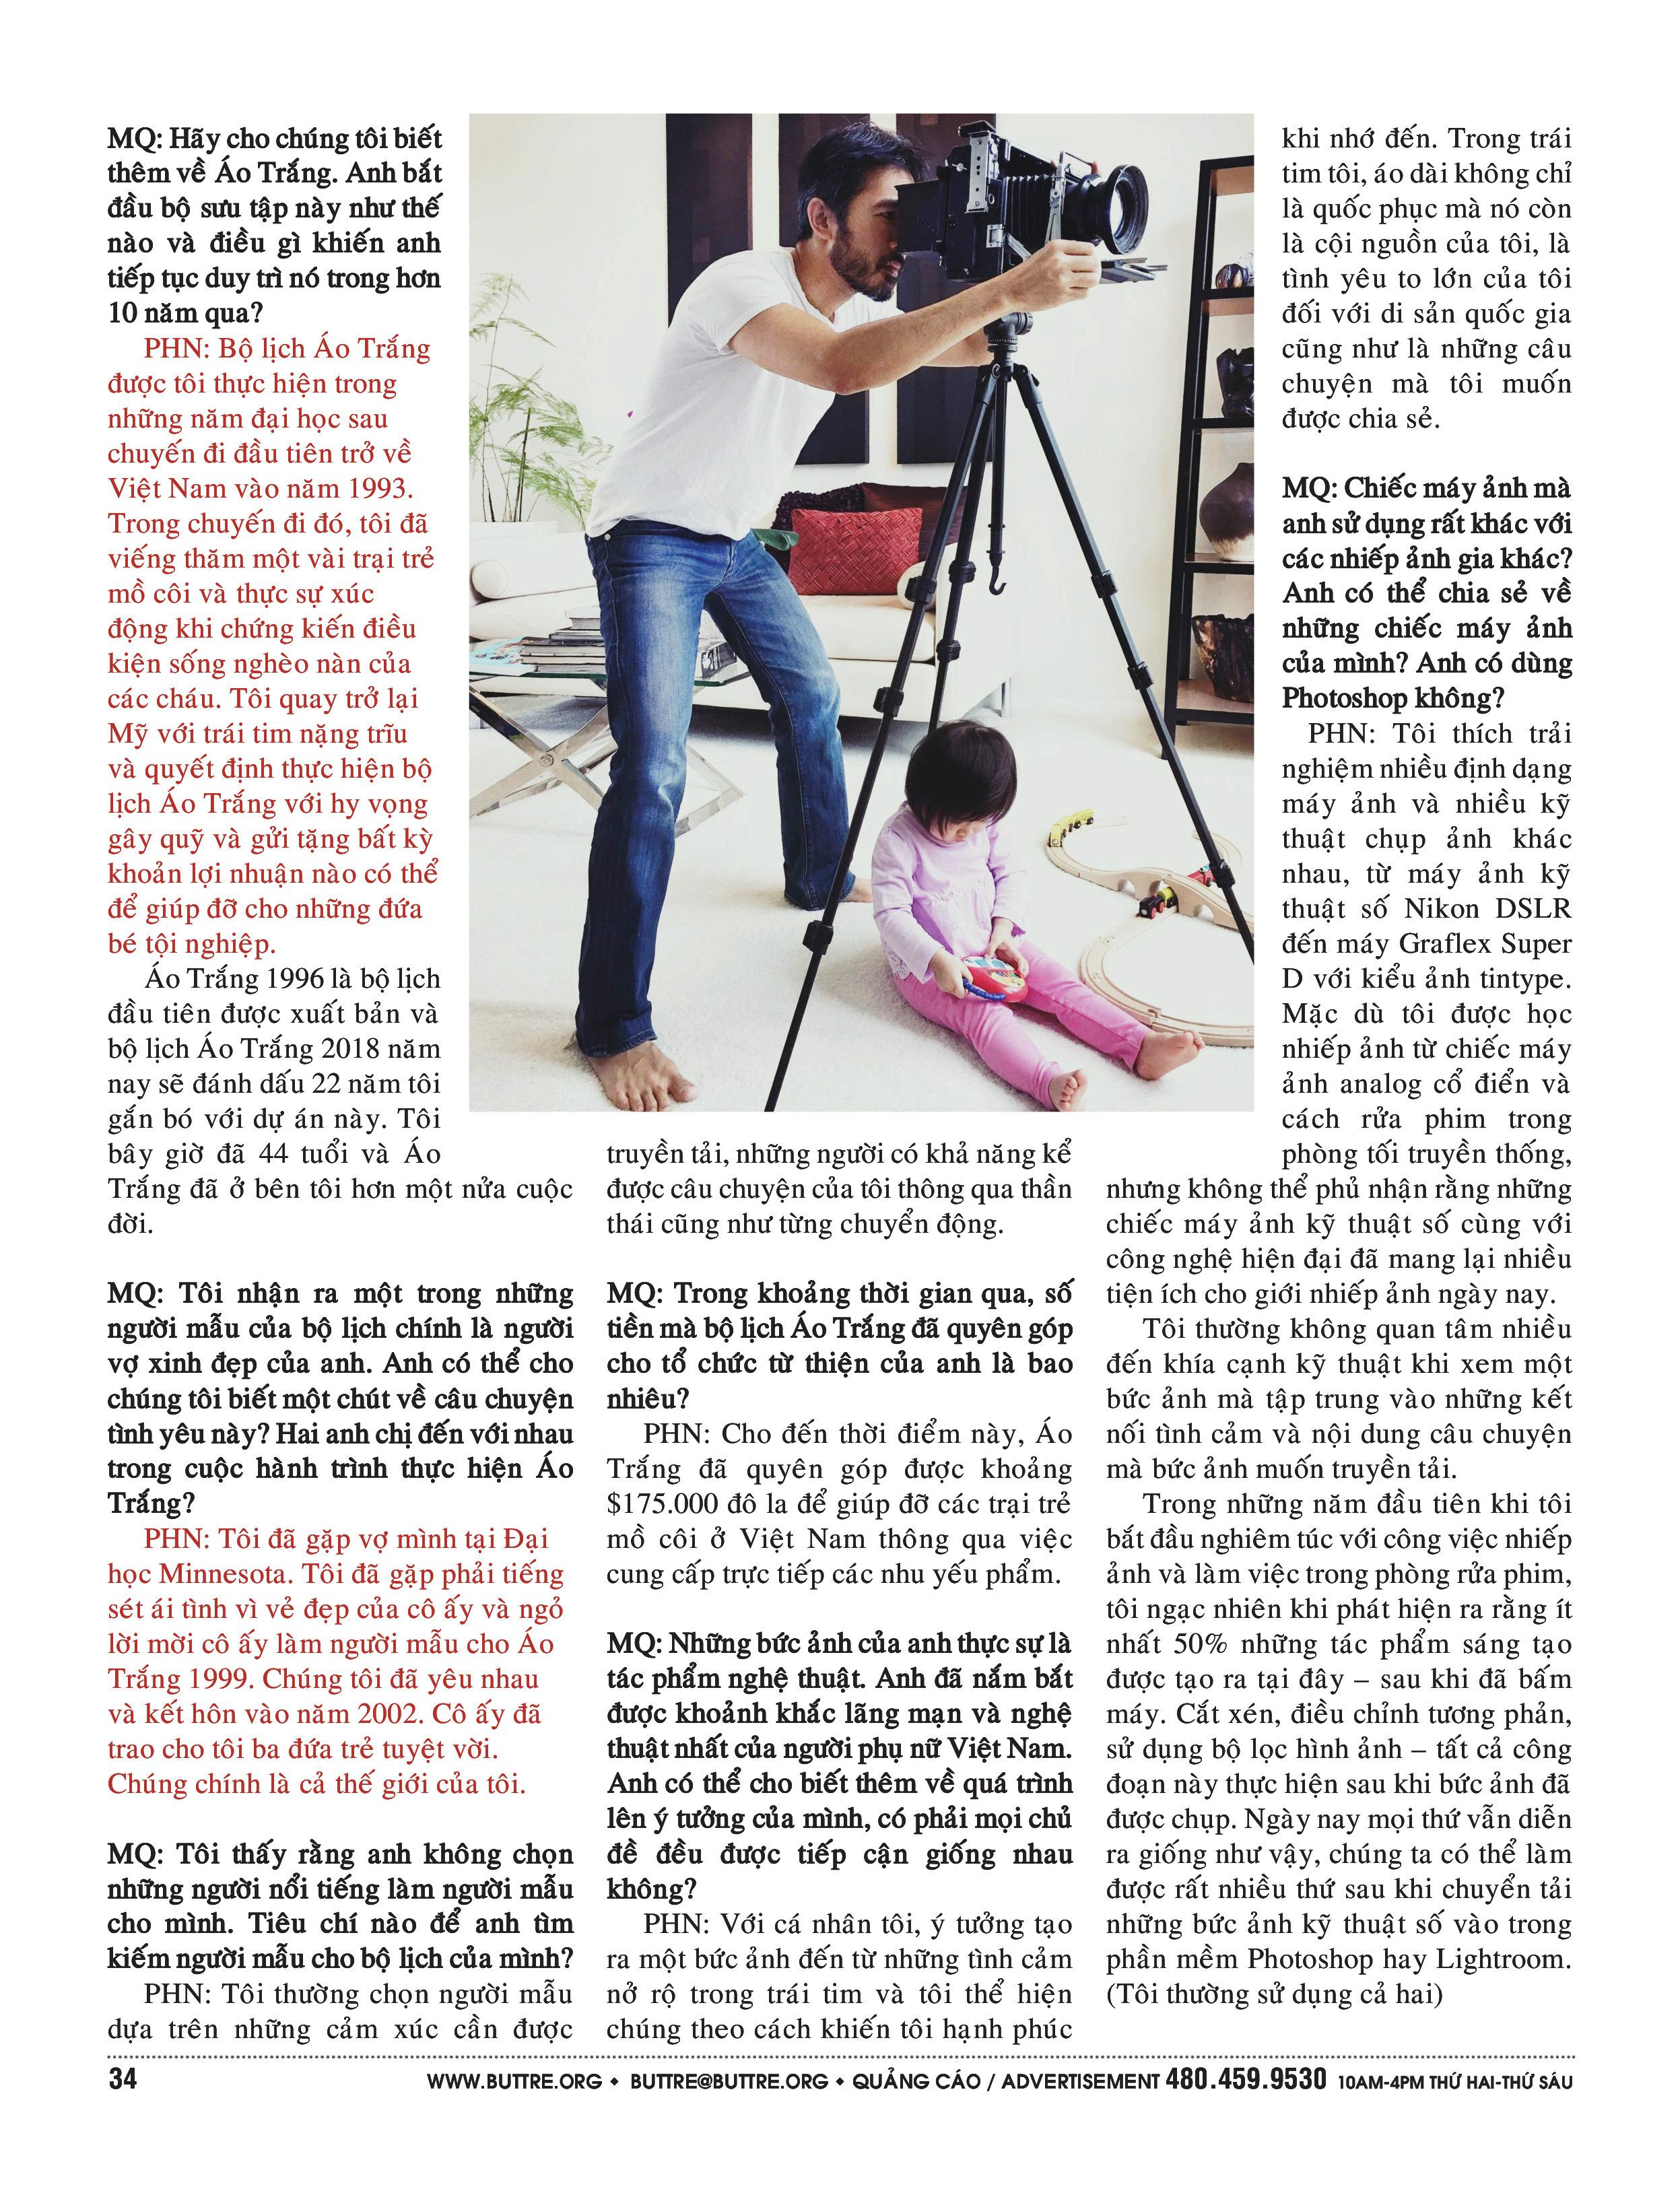 Pham-Hoai-Nam-But-Tre-Interview March 2018-7.jpg